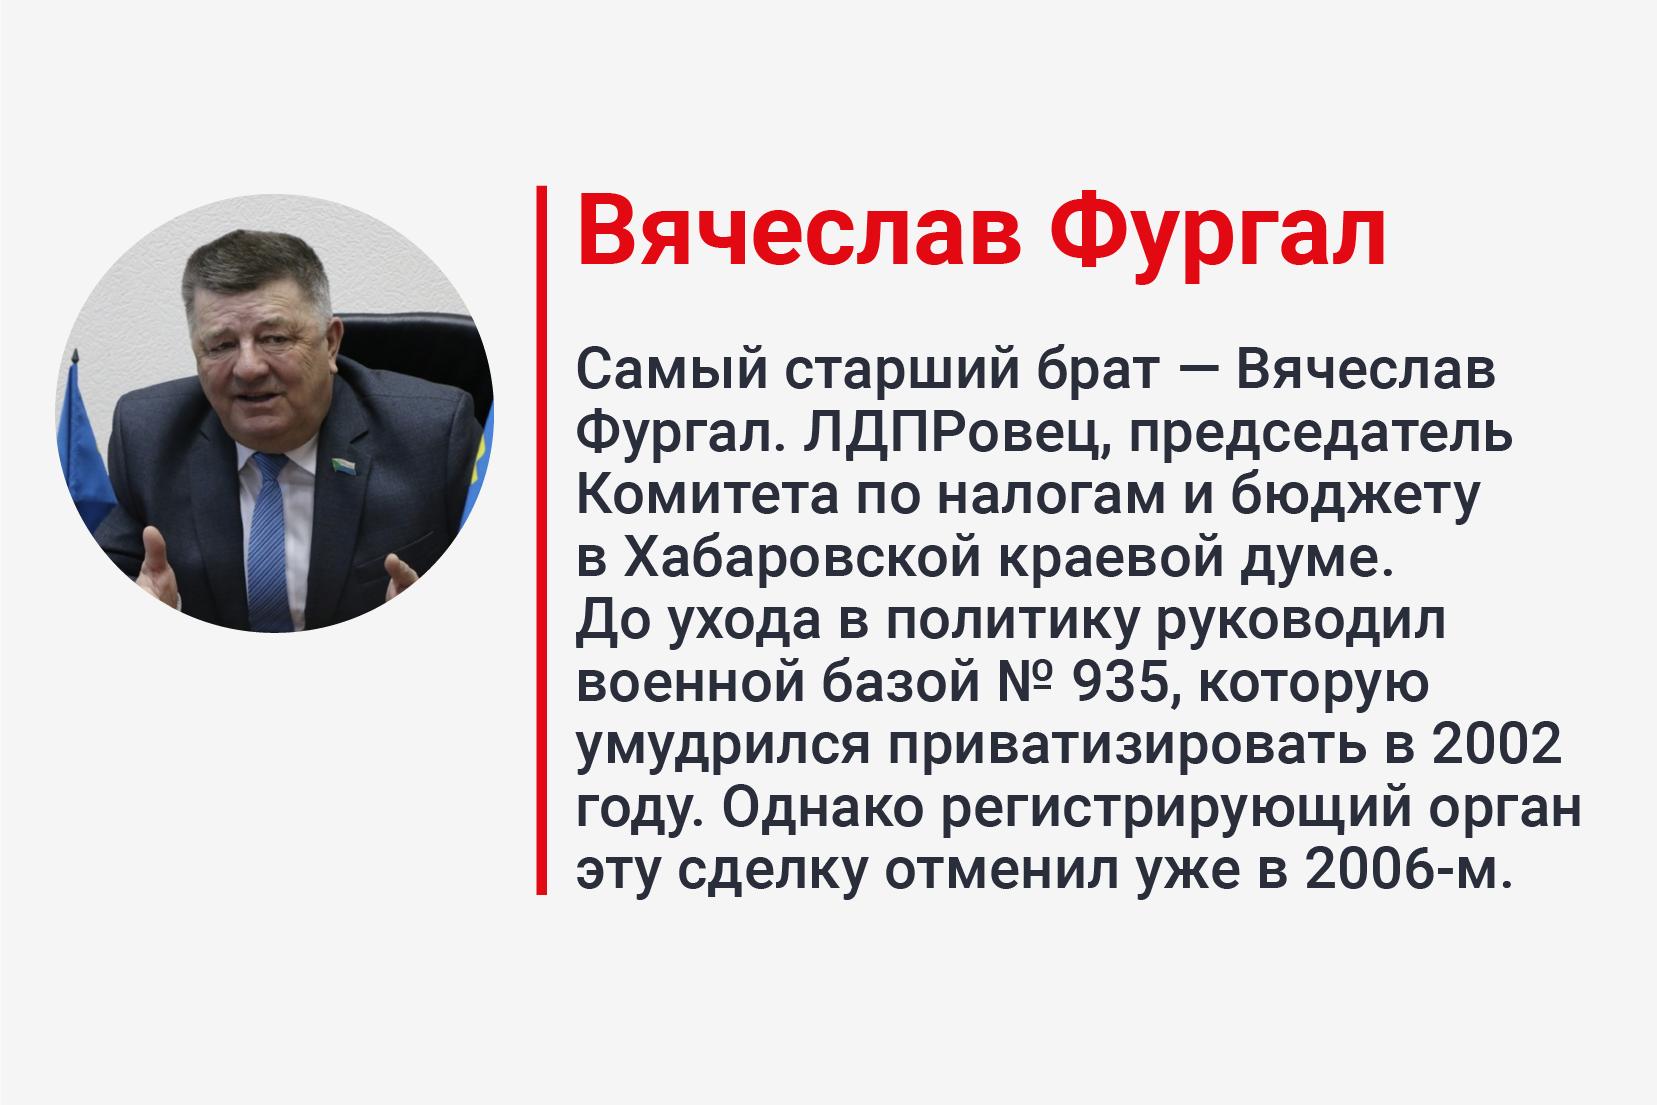 "<p>Фото © <a href=""https://khv.ldpr.ru/region/events/viacheslav-furgal-ldpr-za-vozvrat-rybolovetskikh-artelei-na-amure/"" target=""_self"">ЛДПР</a></p>"